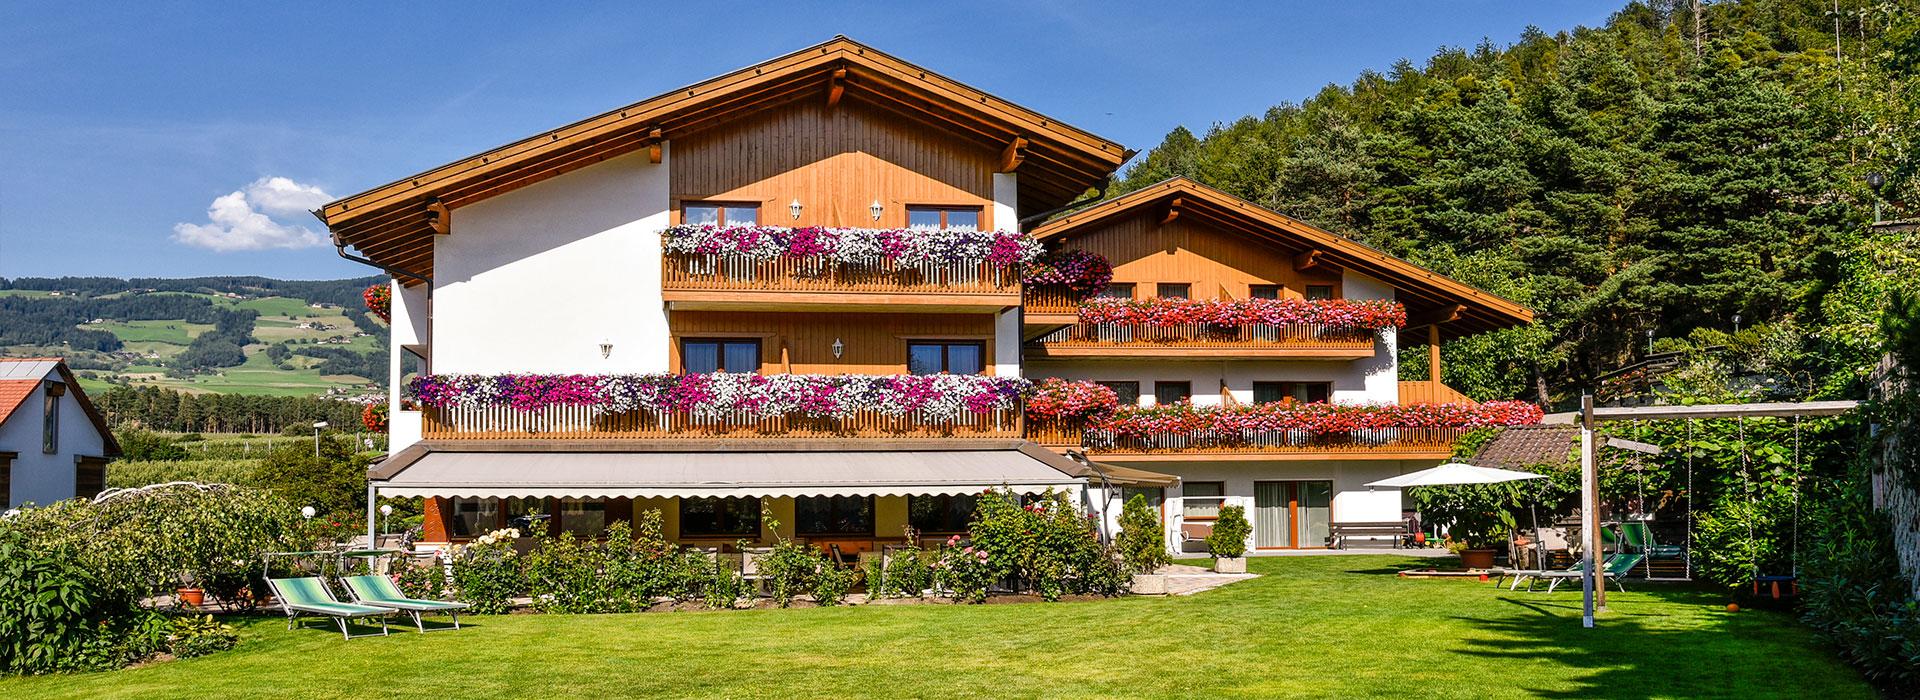 hotel-foehrenhof